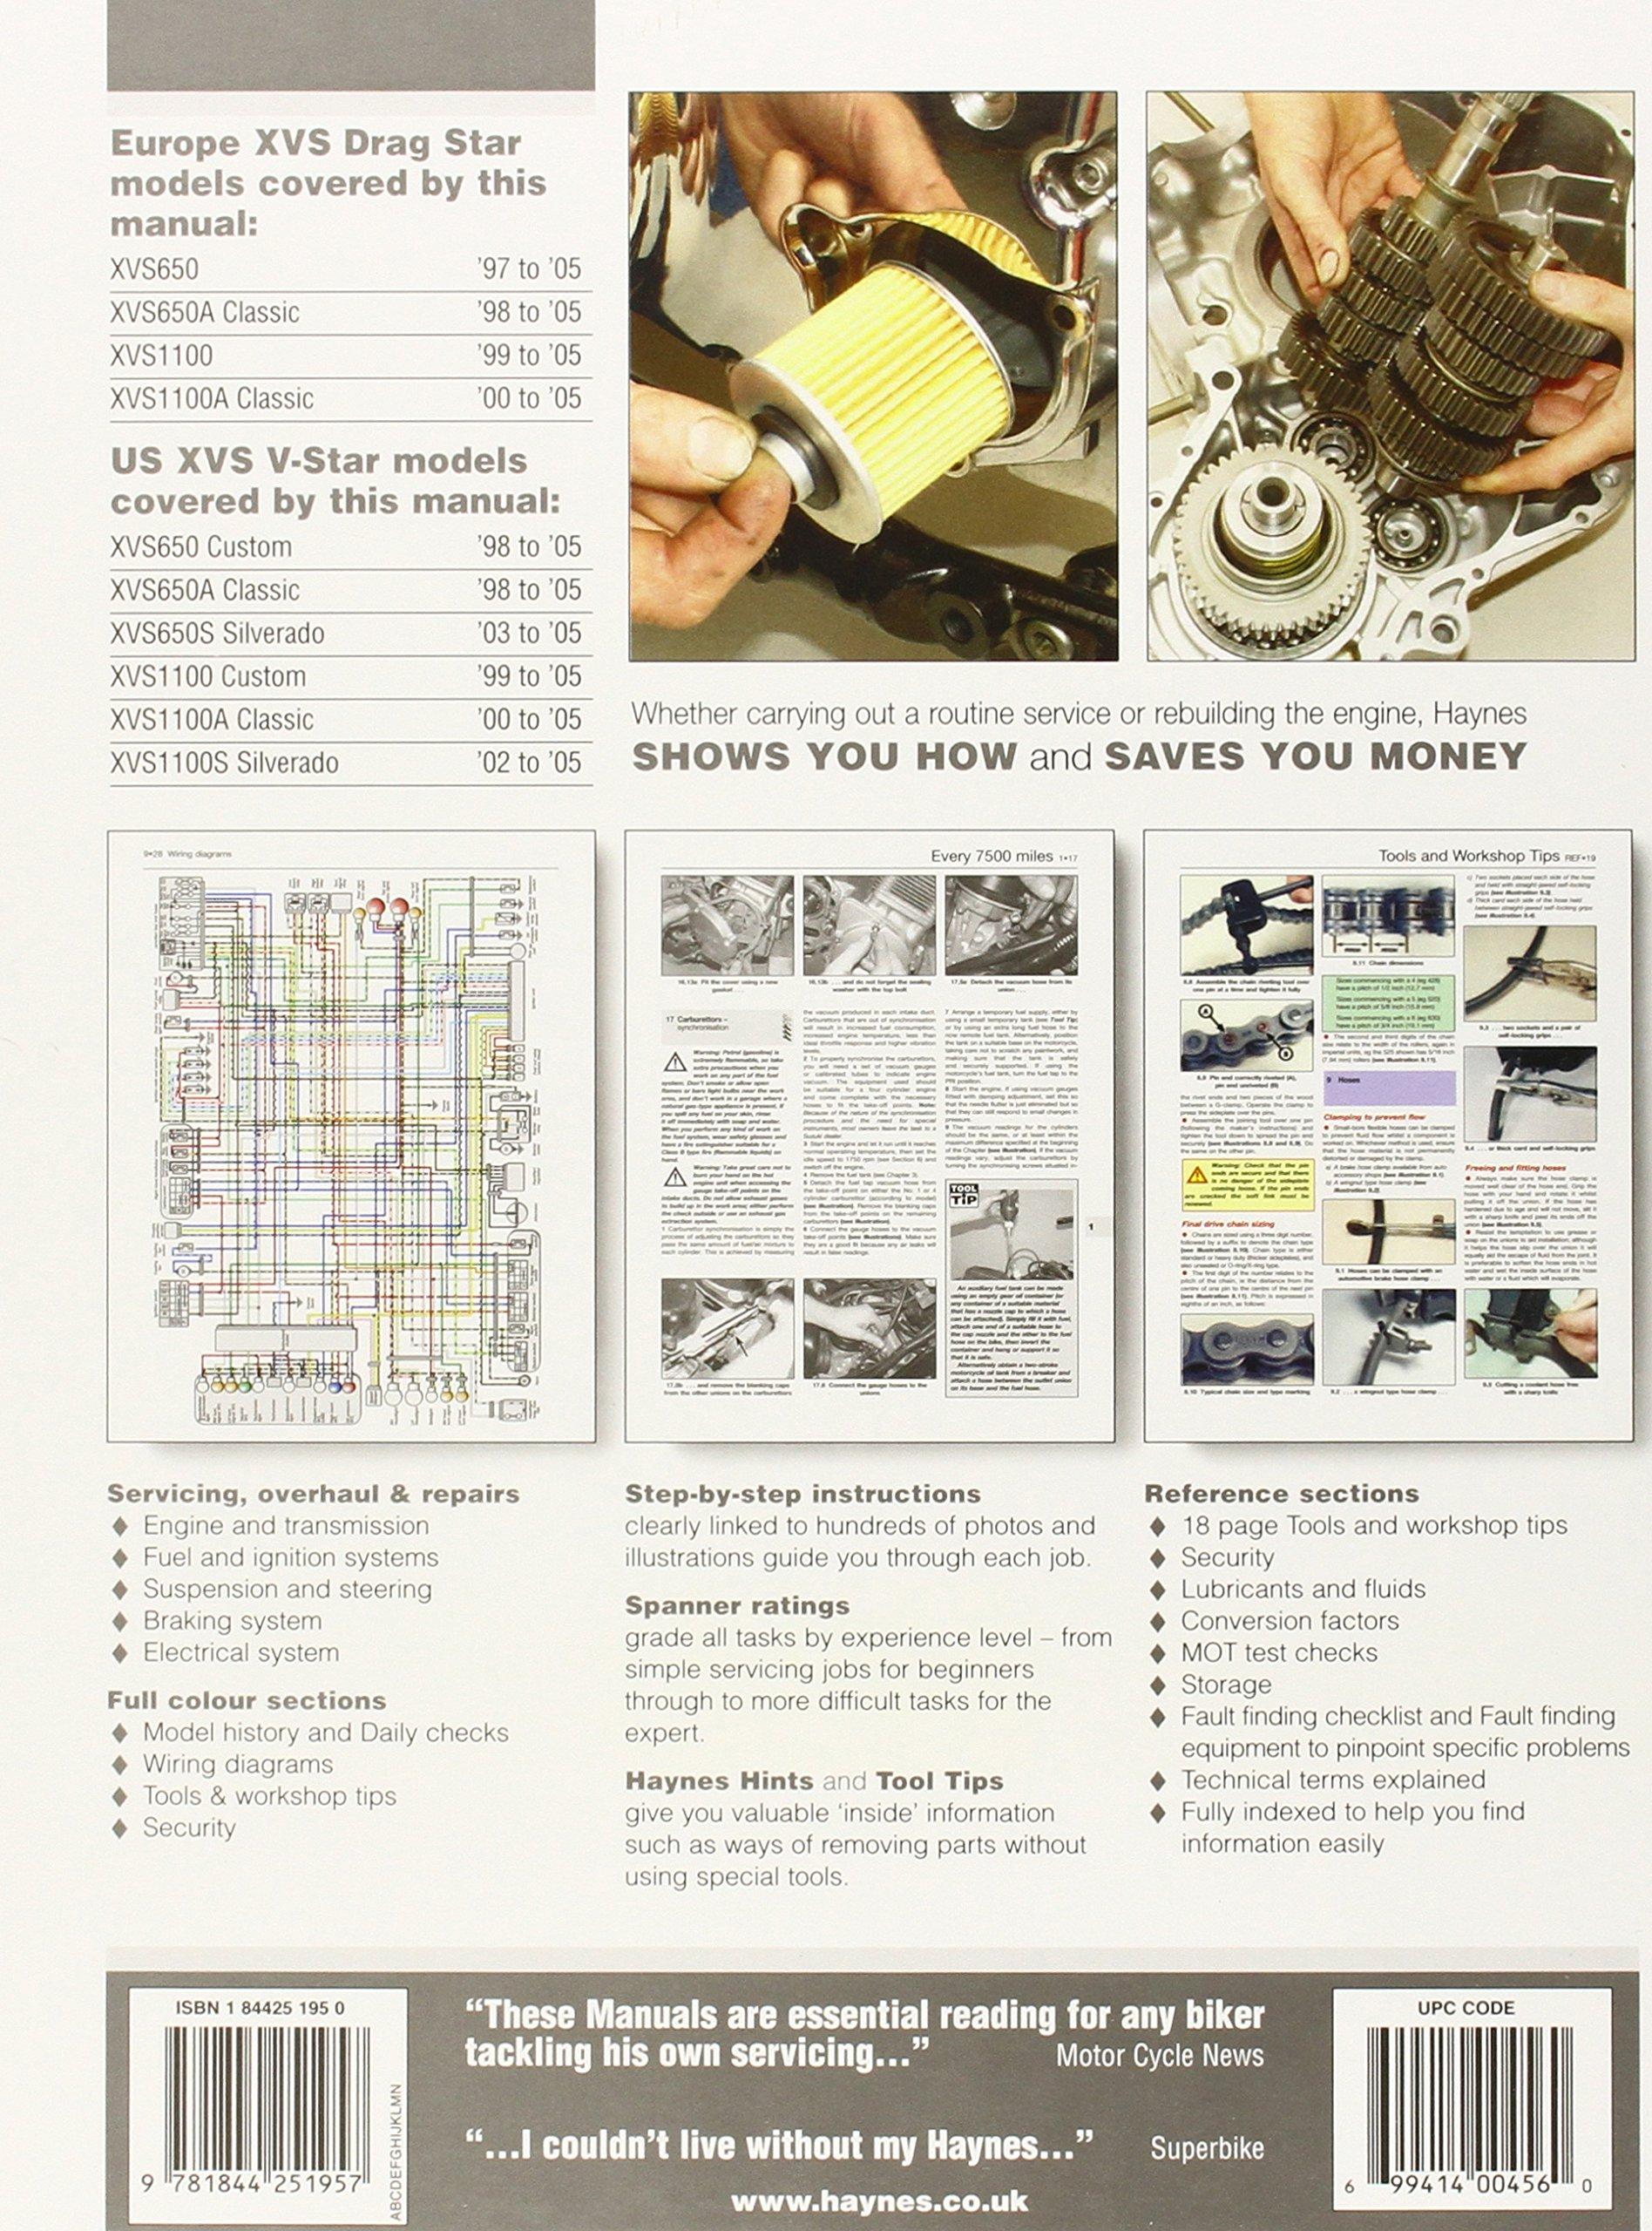 Yamaha XVS650 & 1100 (Drag Star, V-Star) '97 to '05 (Haynes Service & Repair  Manual): Ken Freund: 9781844251957: Amazon.com: Books